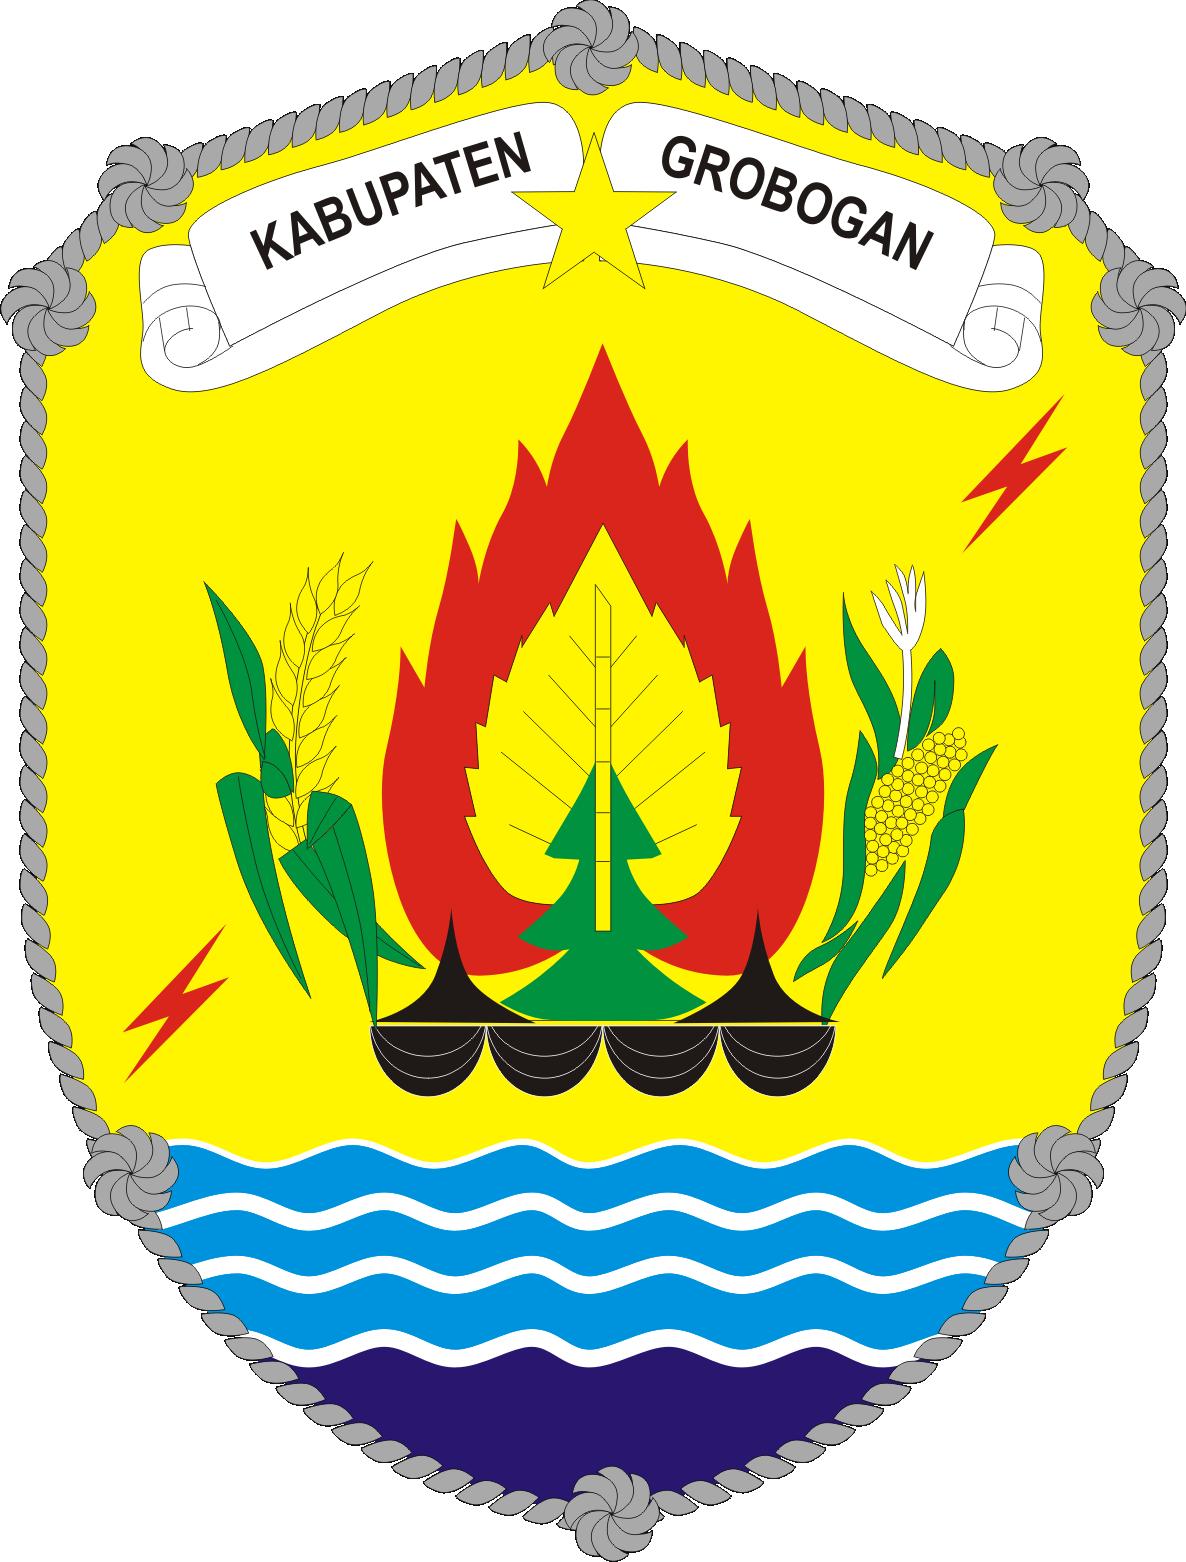 Kabupaten Grobogan Wikipedia Bahasa Indonesia Ensiklopedia Bebas Jati Pohon Kab